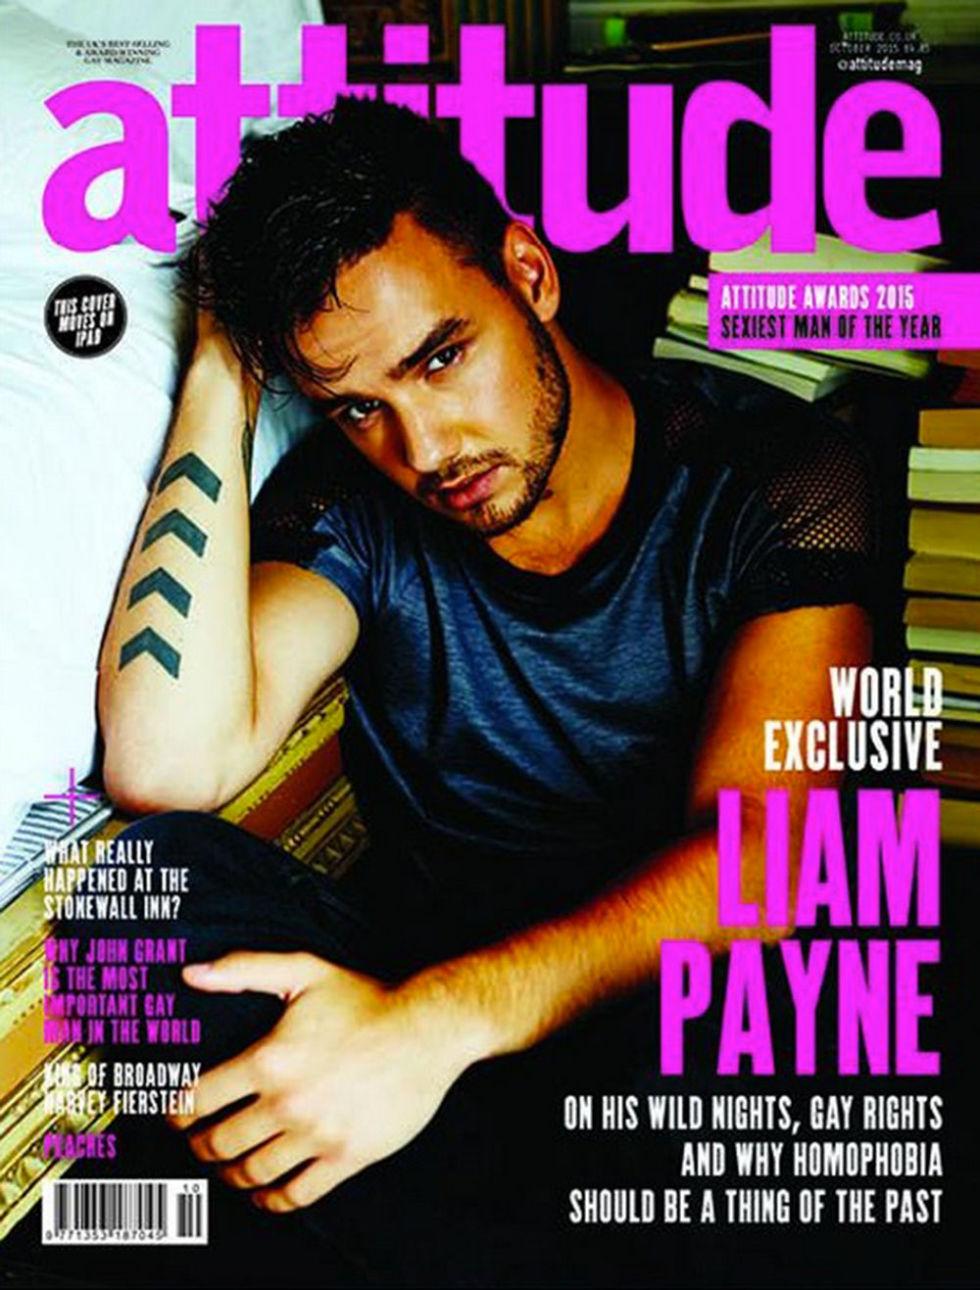 Liam Payne covers Attitude magazine